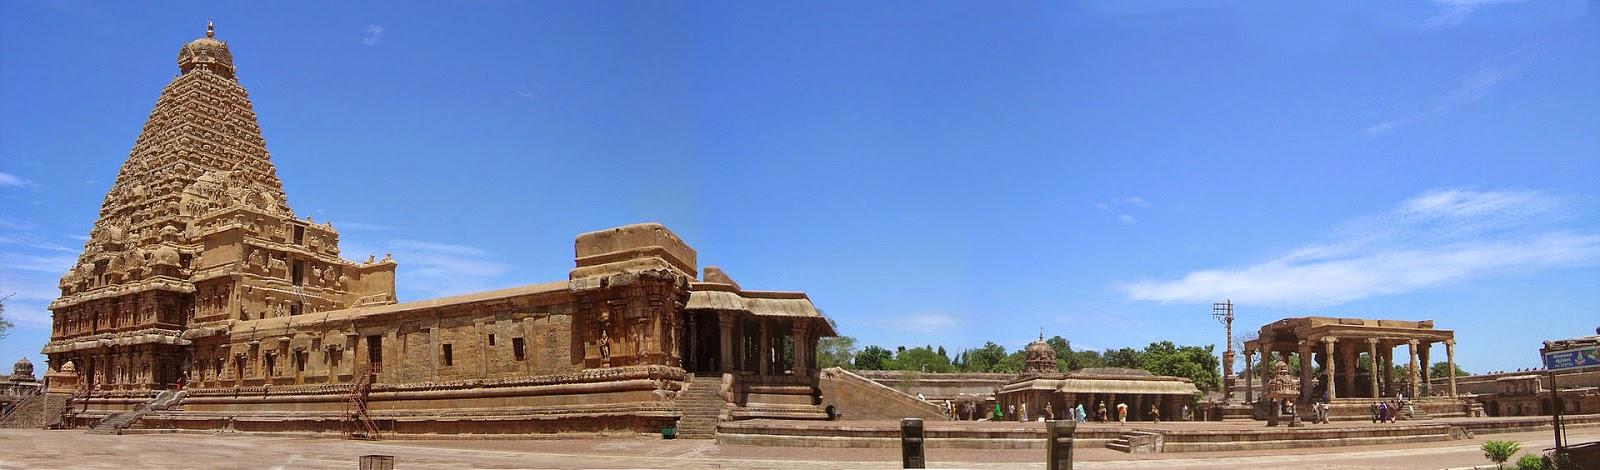 panorama of Bragatheeswarar temple, India